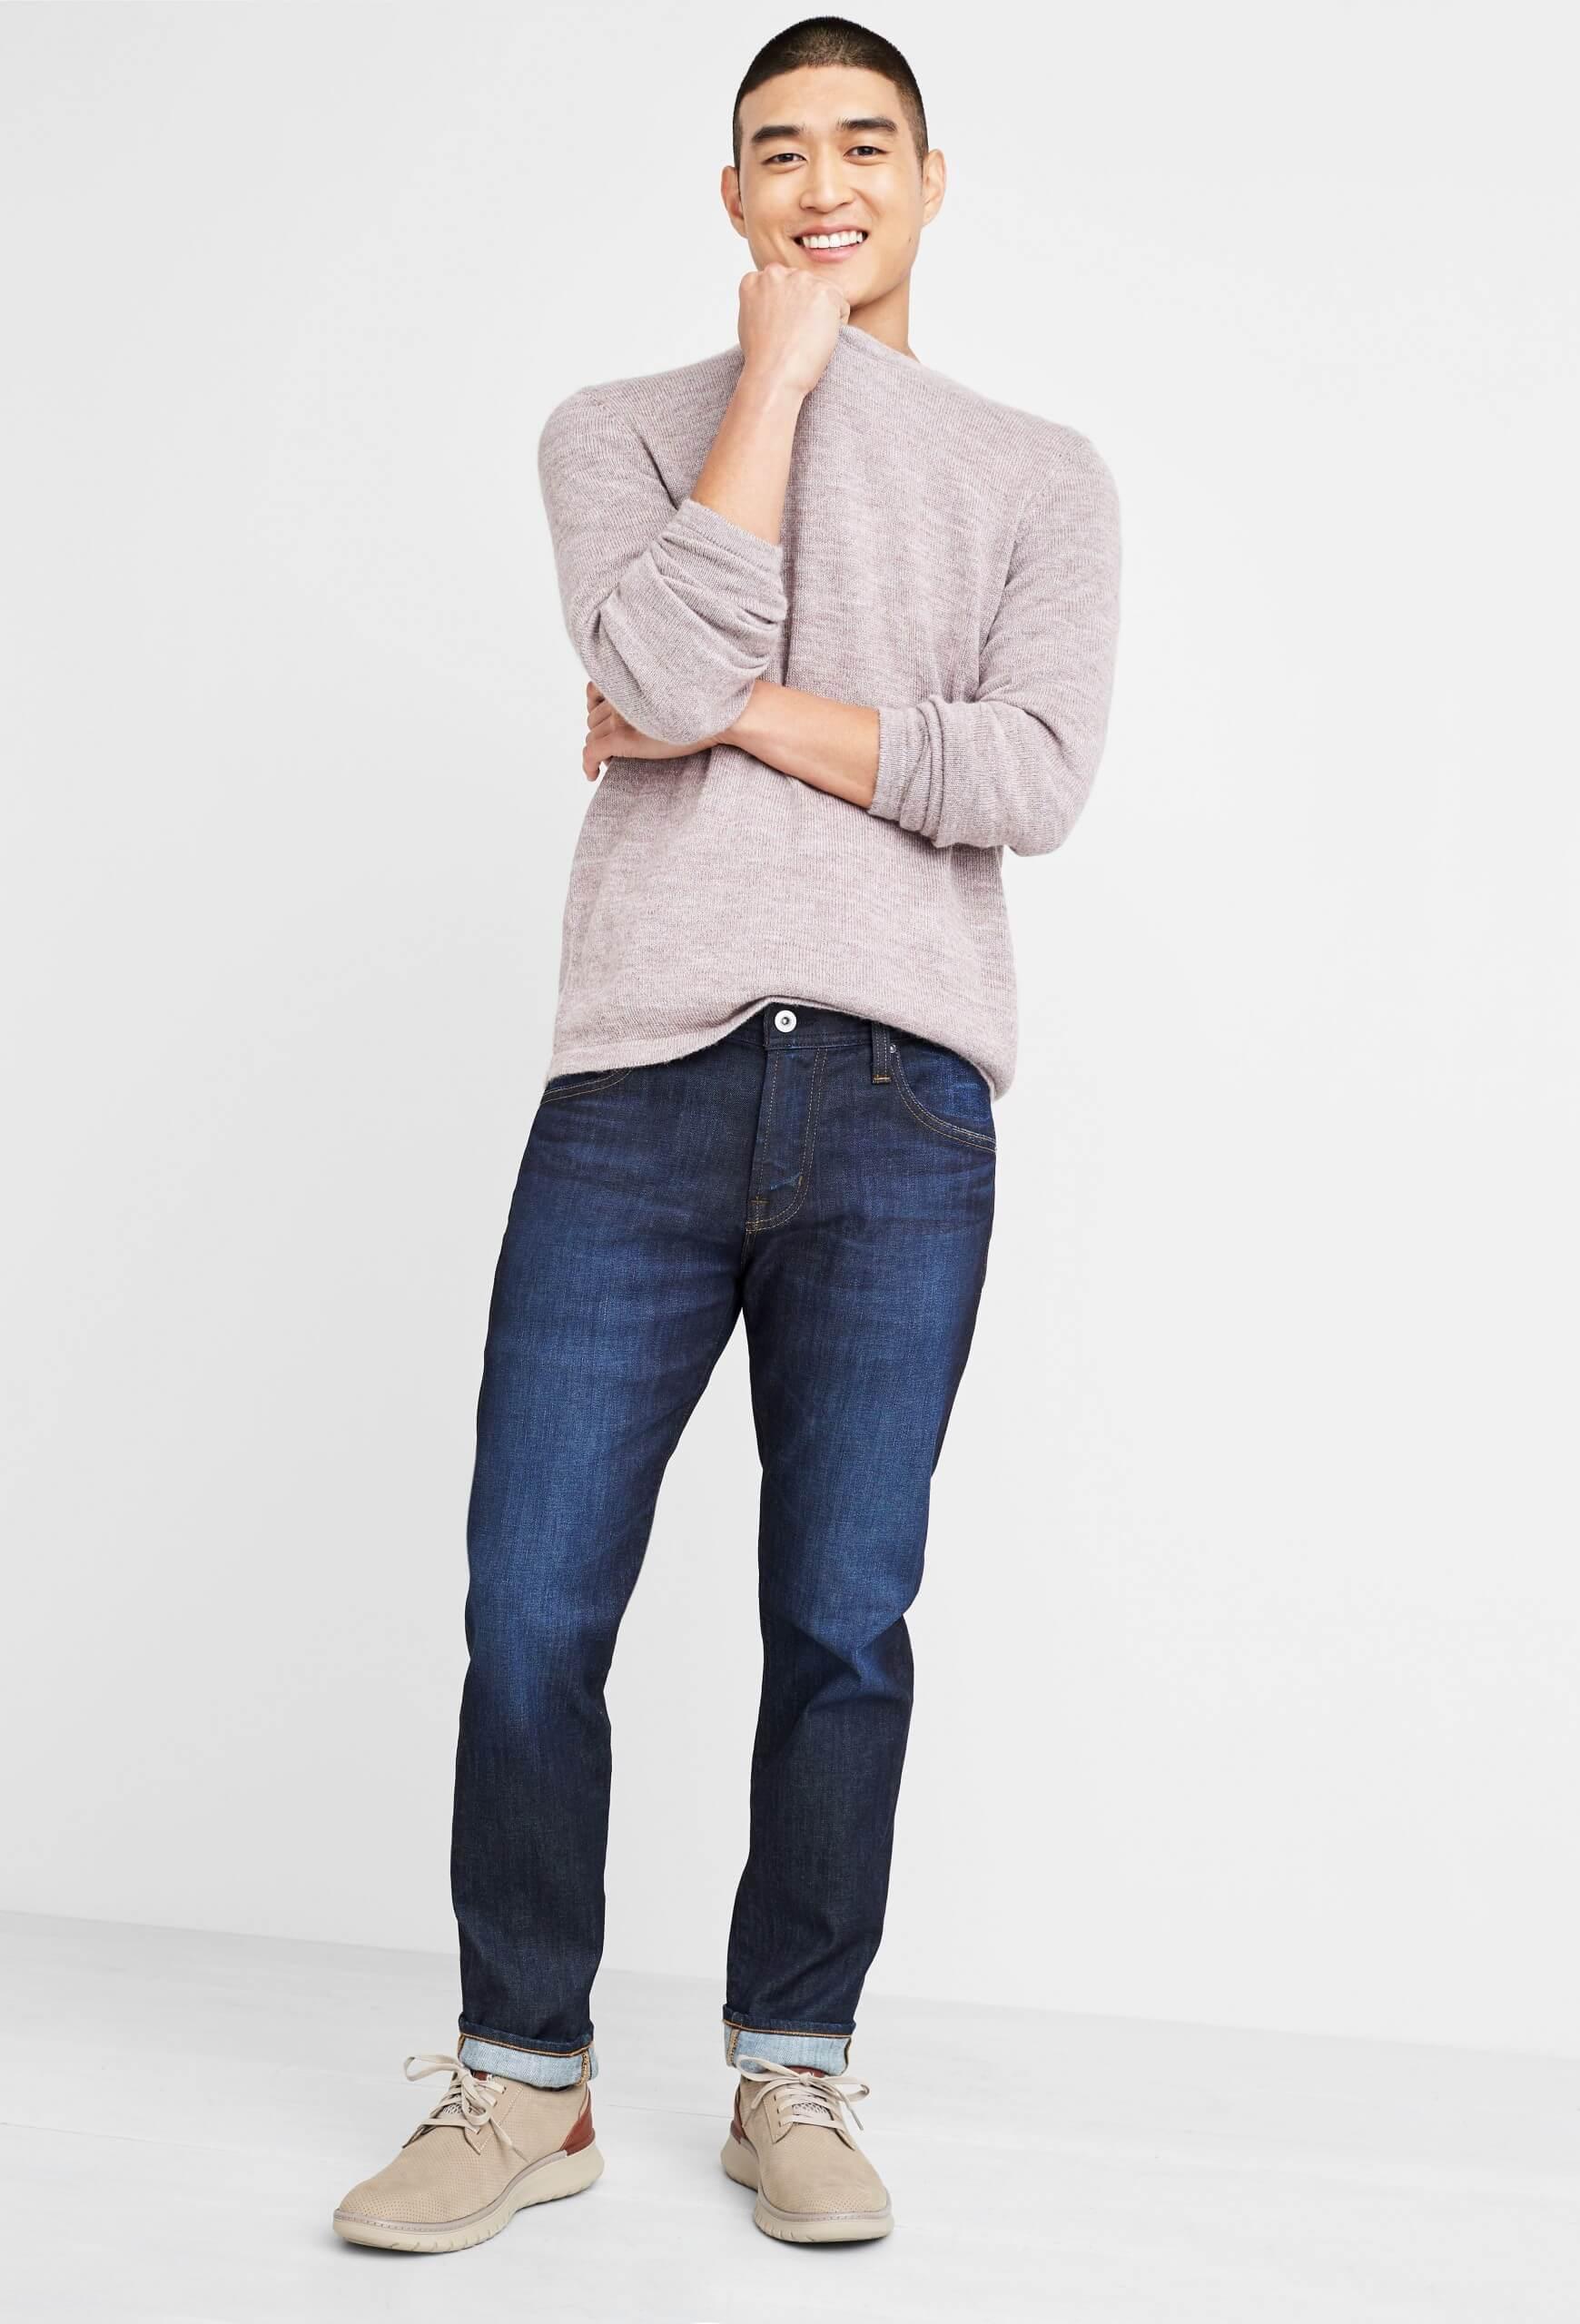 Stitch Fix Men's model wearing dark wash jeans, beige crewneck sweater and beige leather sneakers.